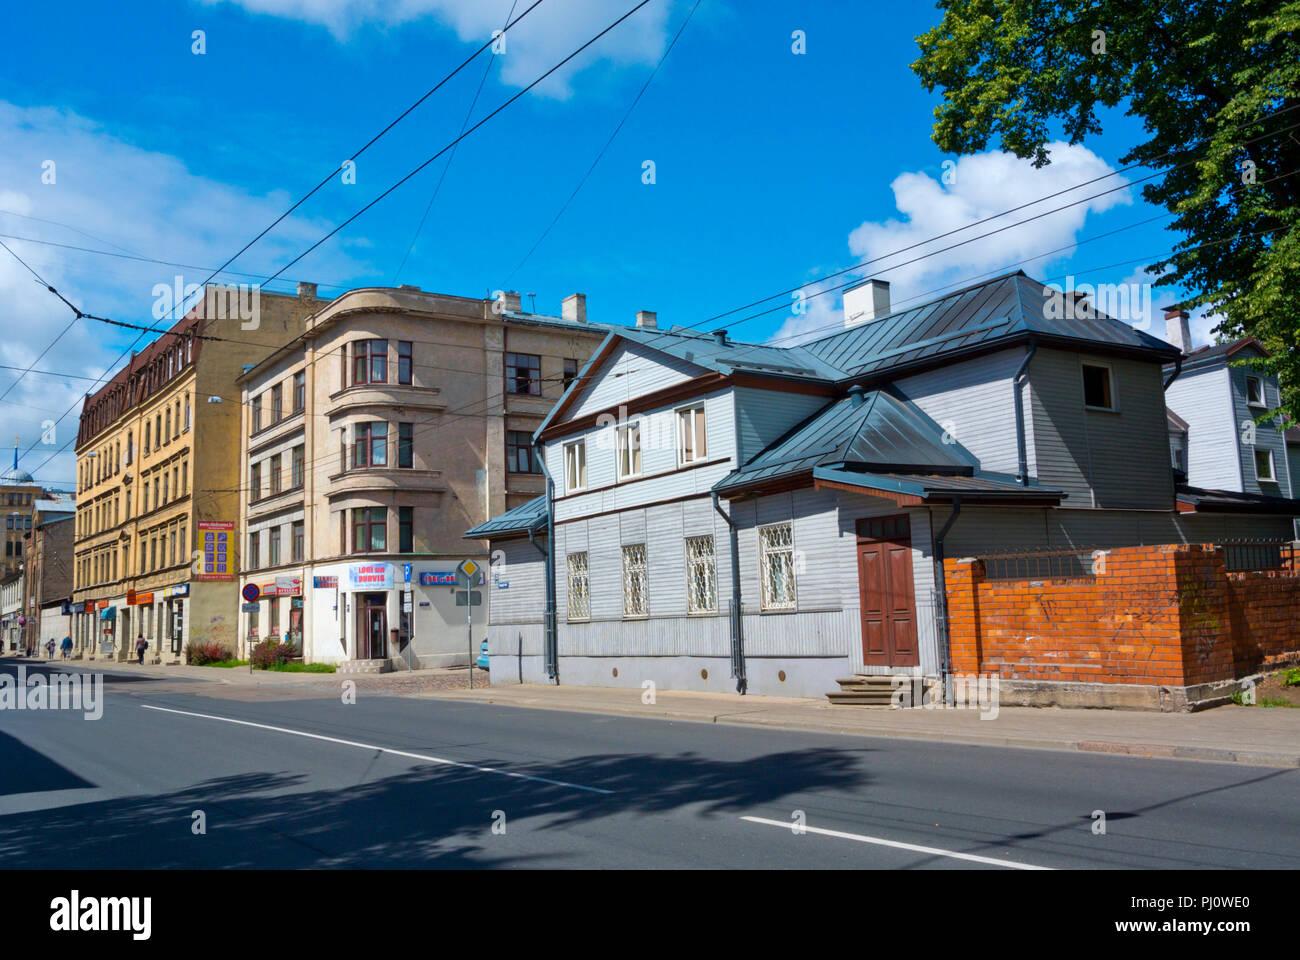 Gogola iela, Maskavas forstate, Riga, Latvia - Stock Image